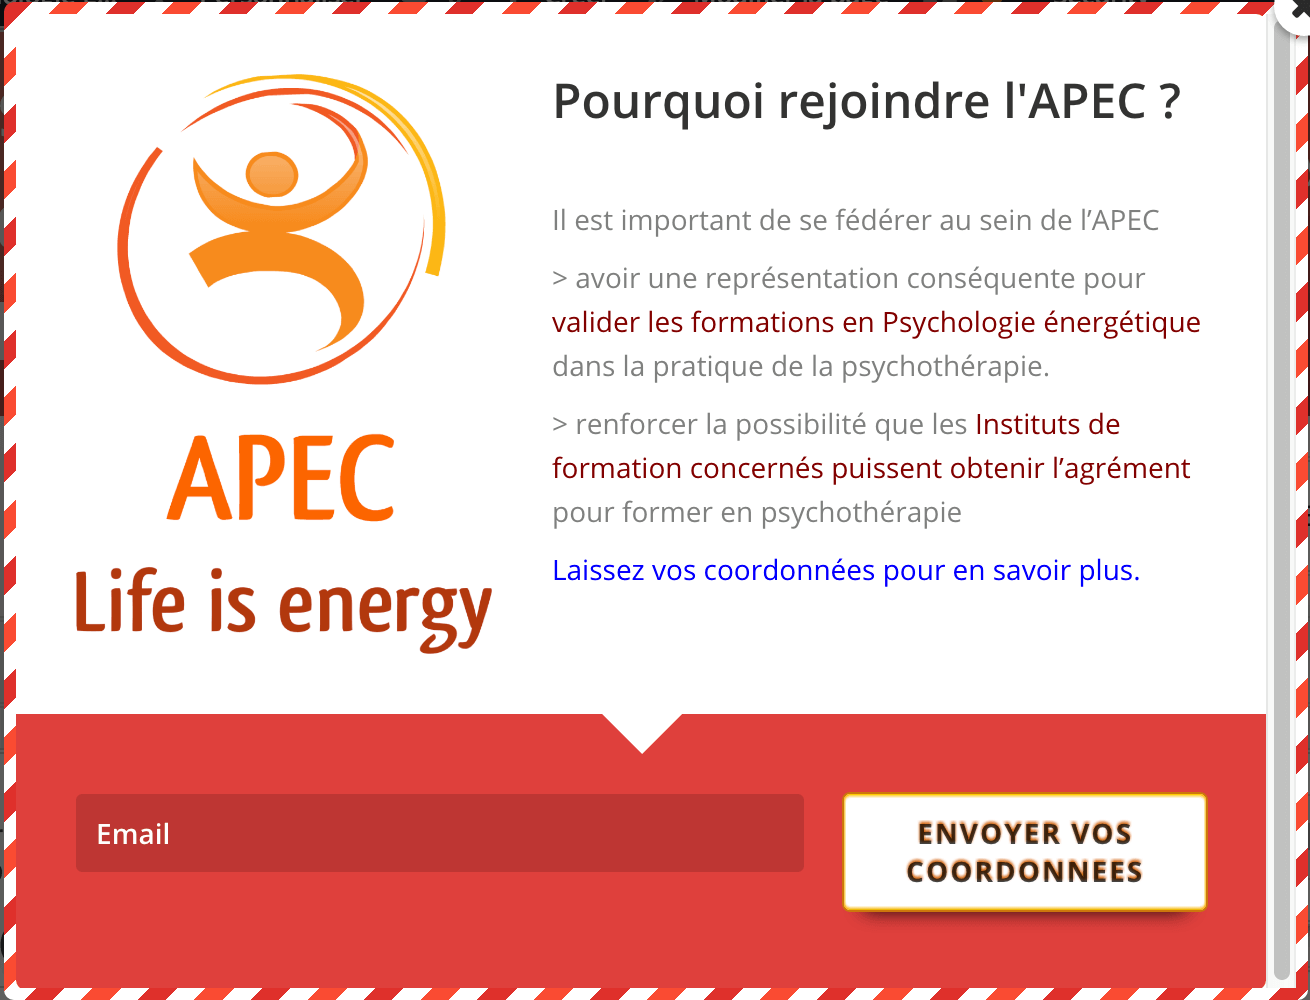 APEC energypsy.org